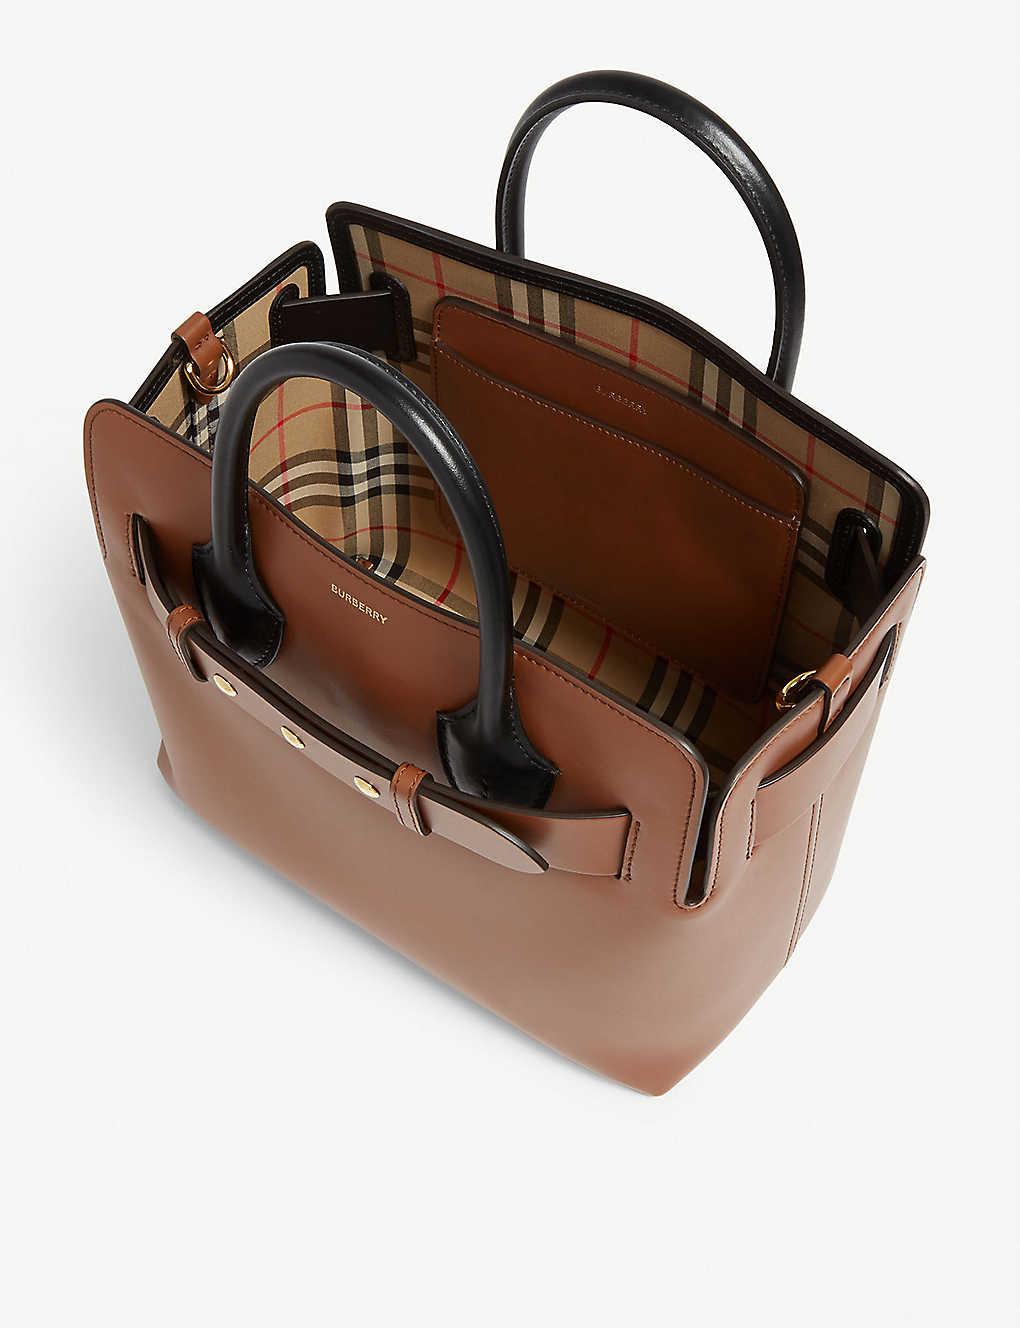 87b27e1a7 ... Belt leather bag - Malt brown check zoom